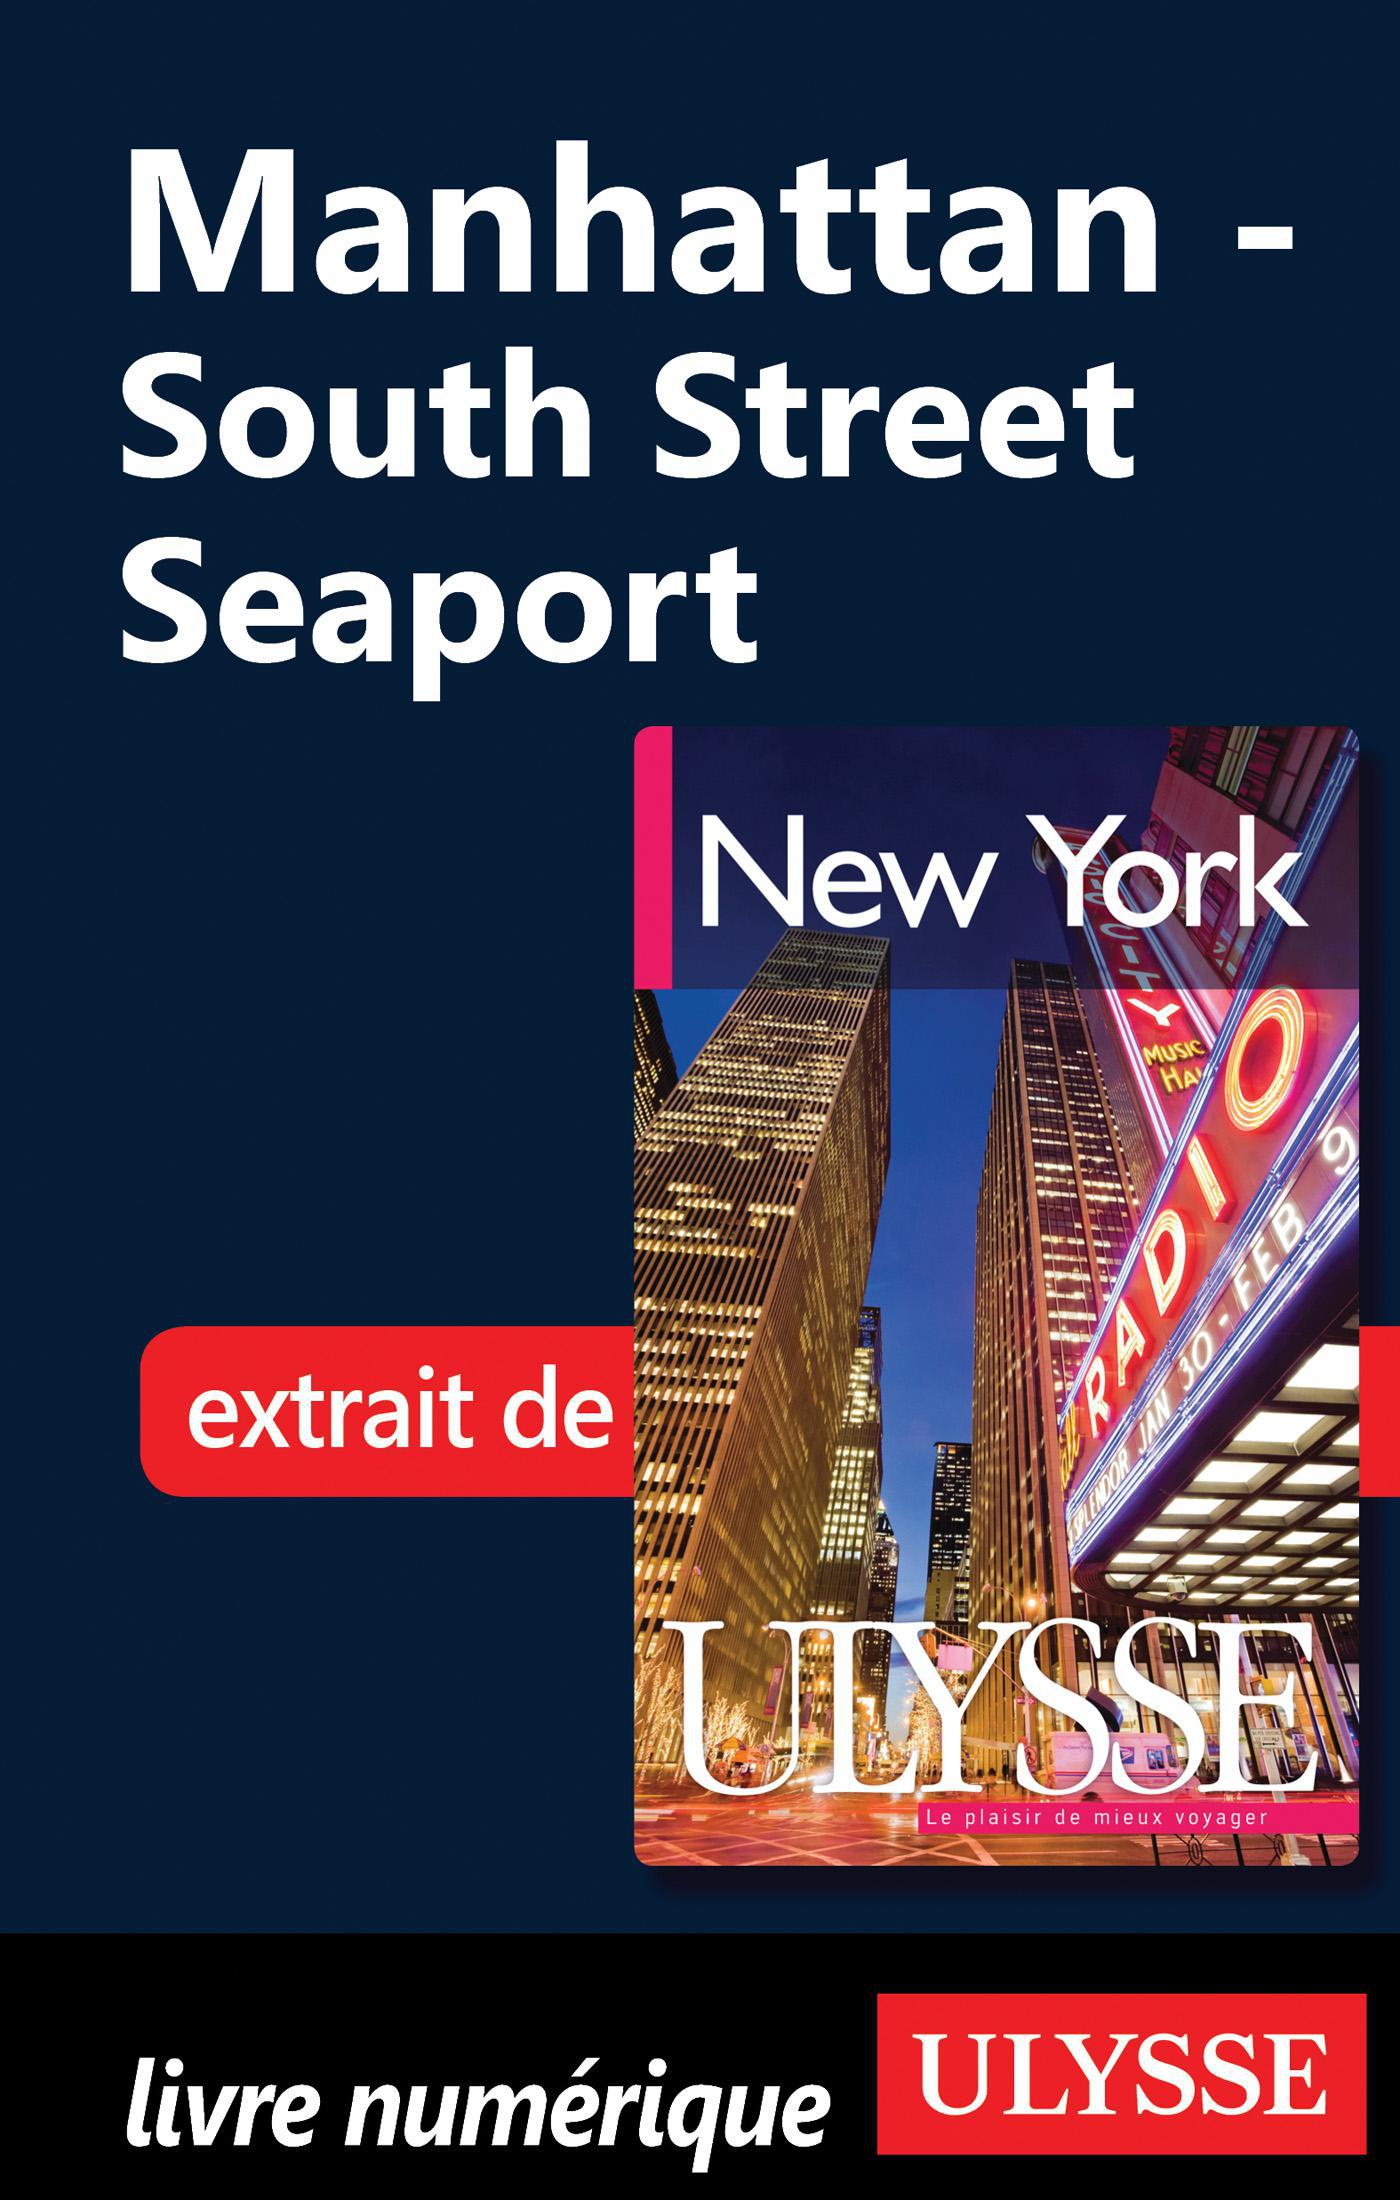 Manhattan - South Street Seaport